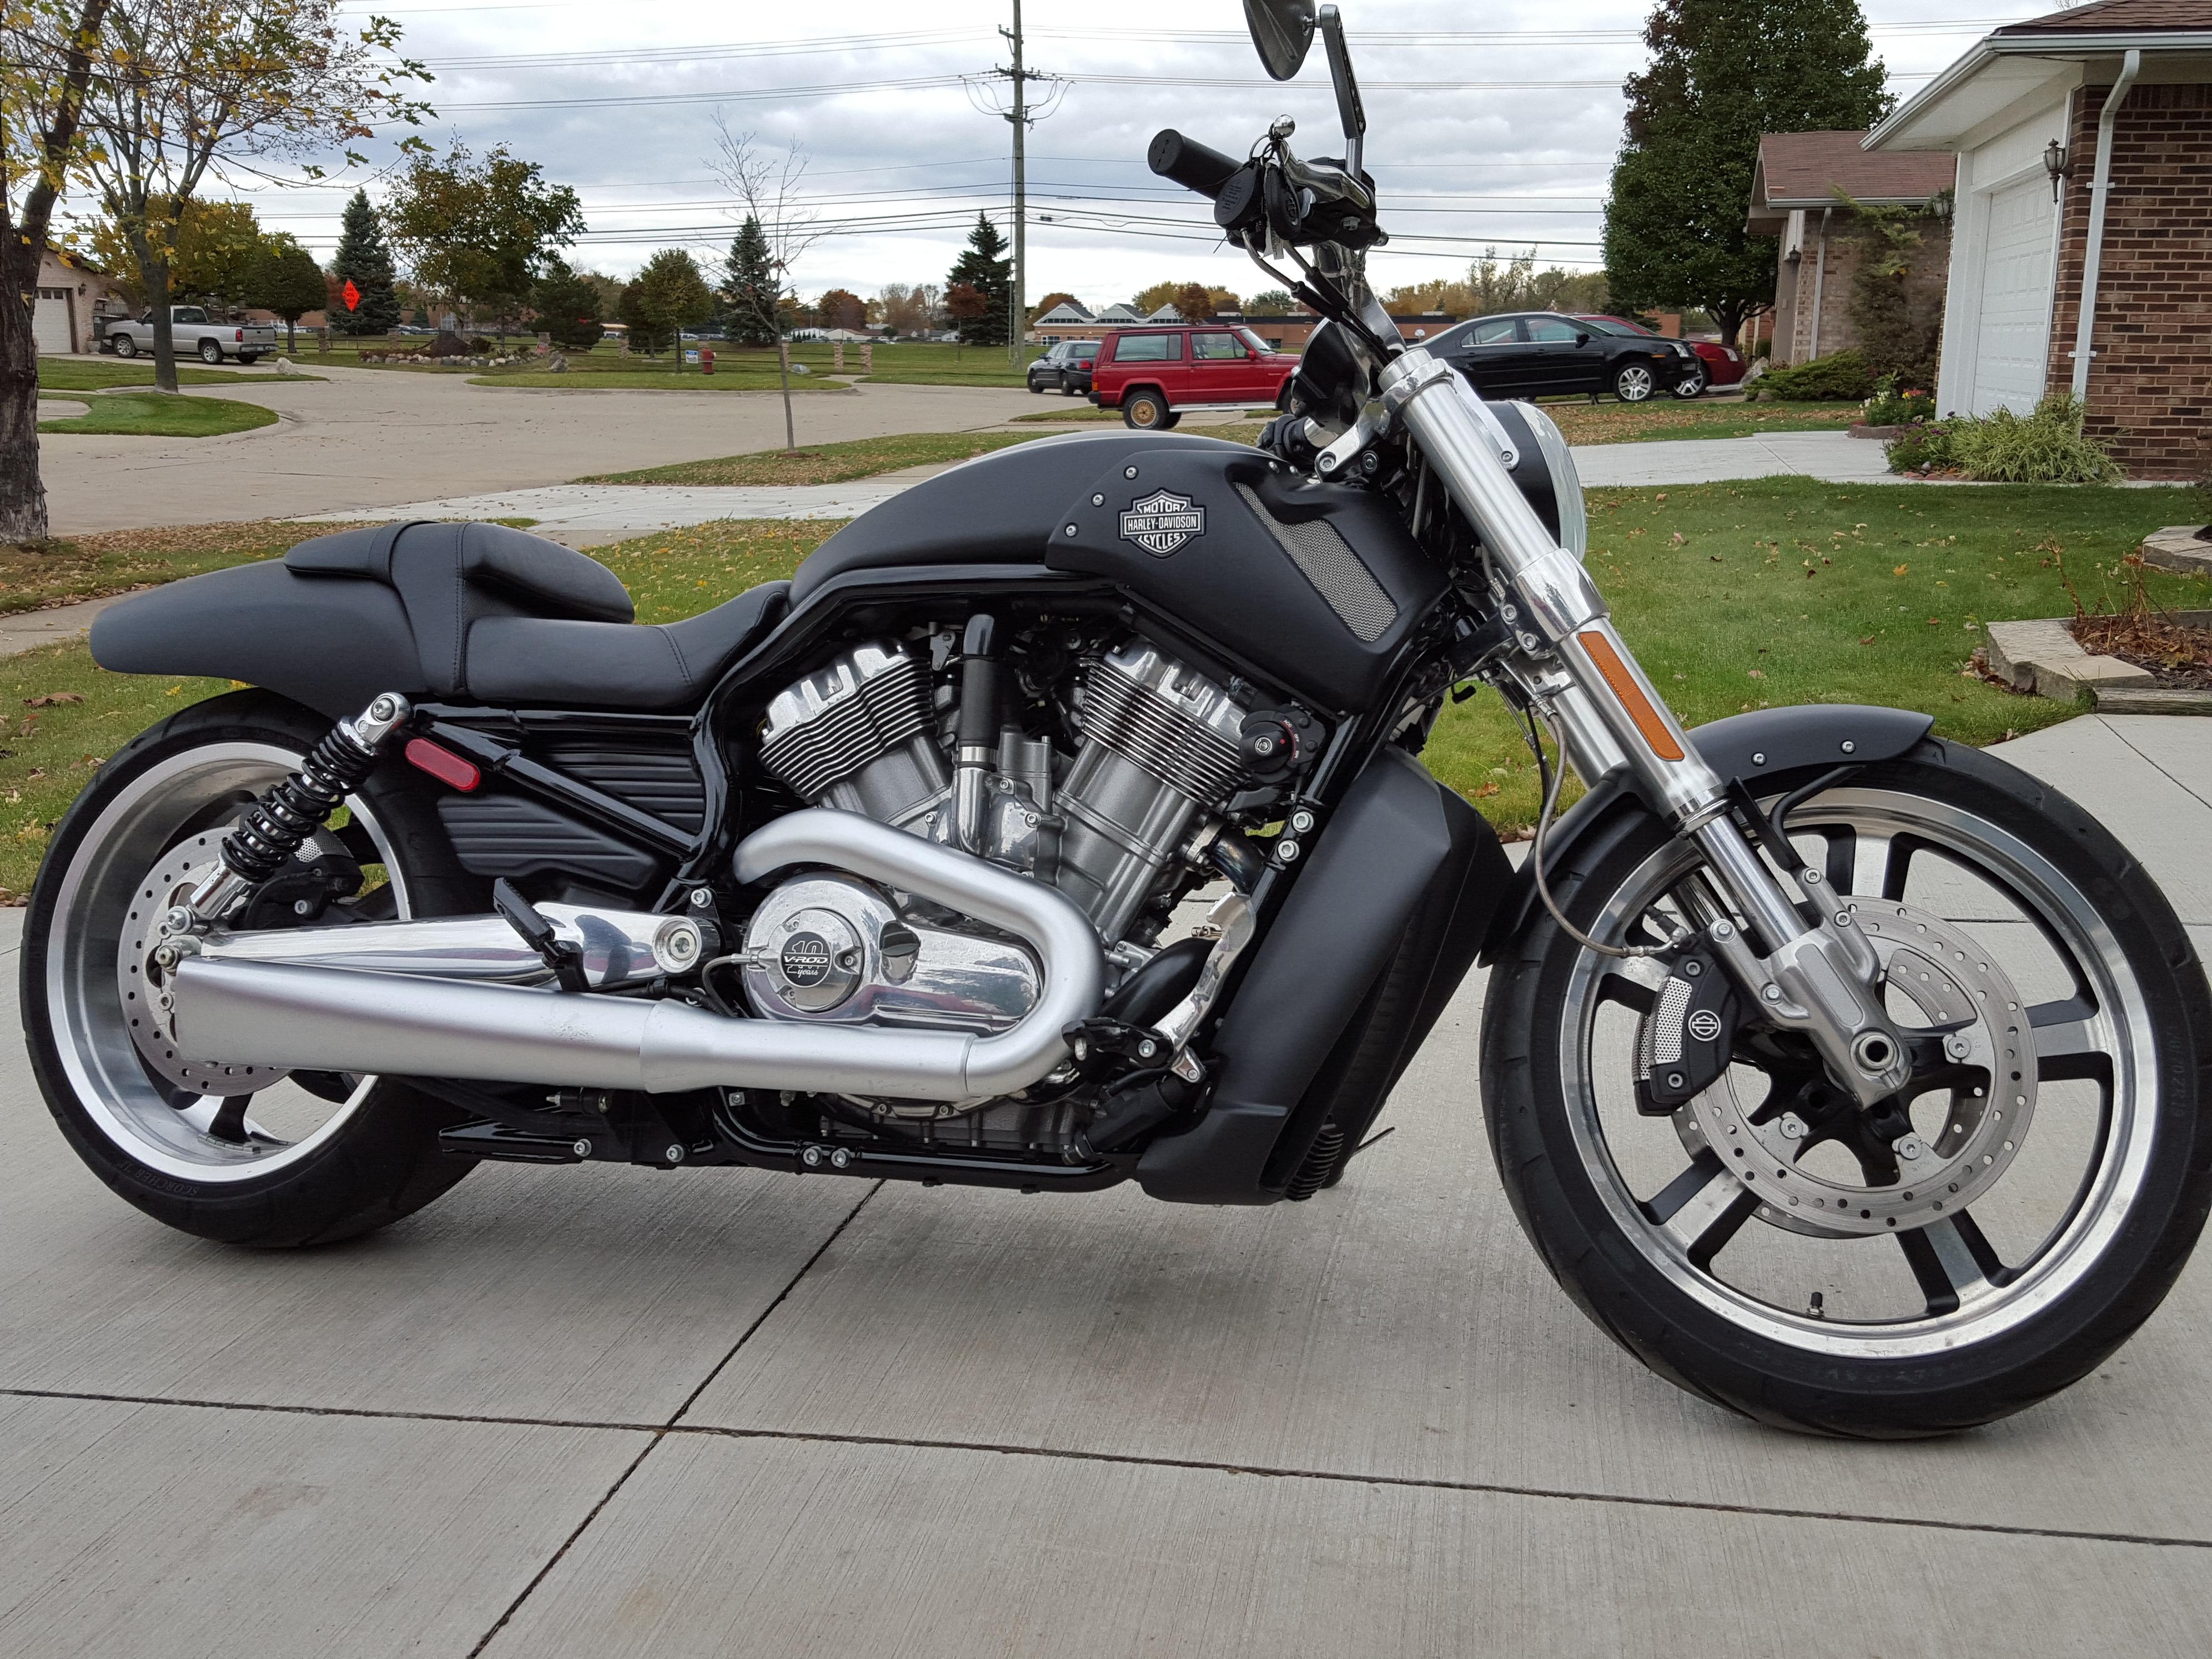 Photo 2012 Harley-Davidson V-ROD MUSCLE $8900188.68188.68